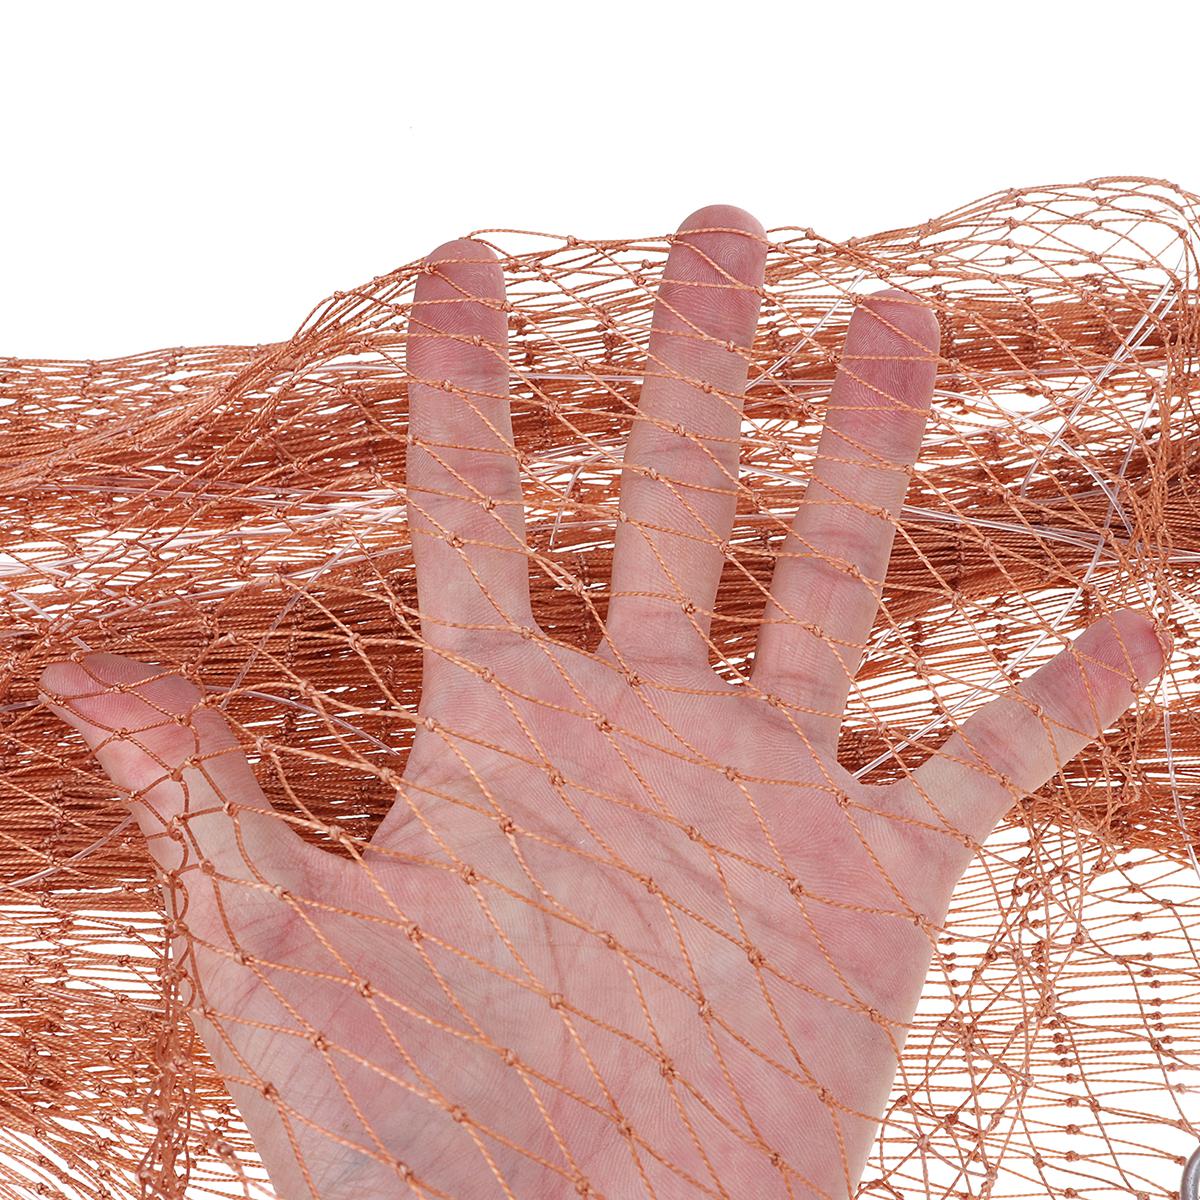 3.0M 10FT Hand Easy Throw Руководство Рыбалка Сетка Spin Bait Сетка для литья шин - фото 10